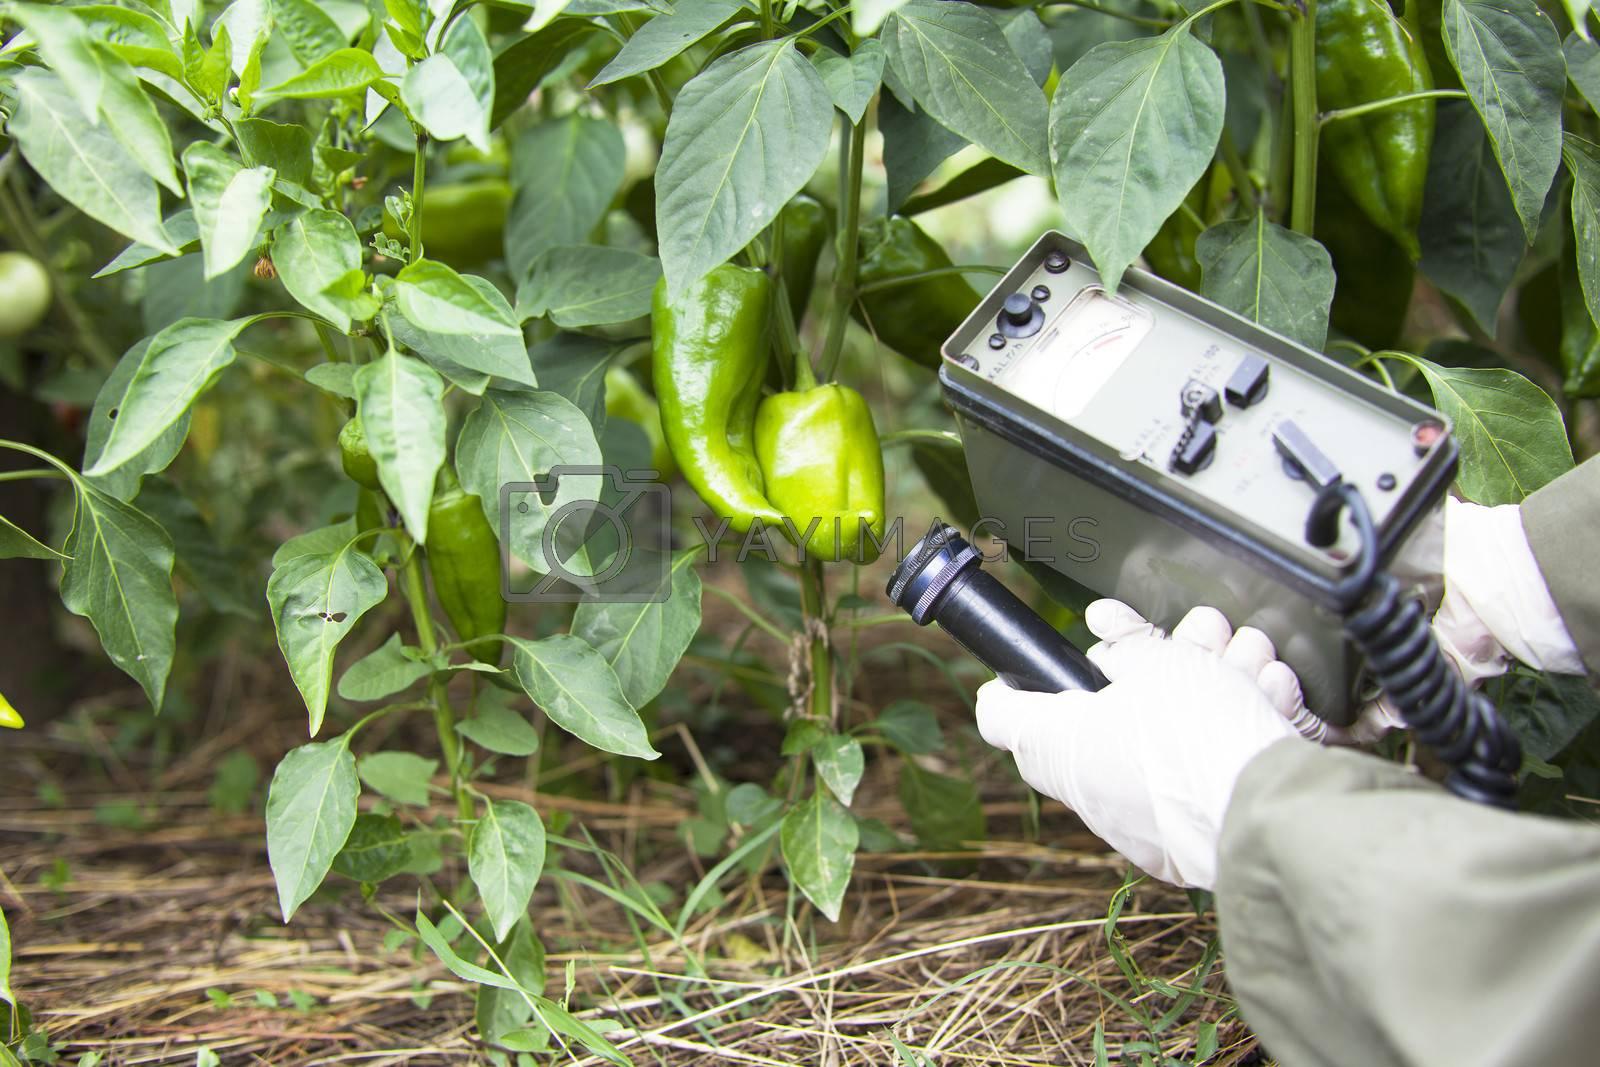 Measuring radiation levels of pepper